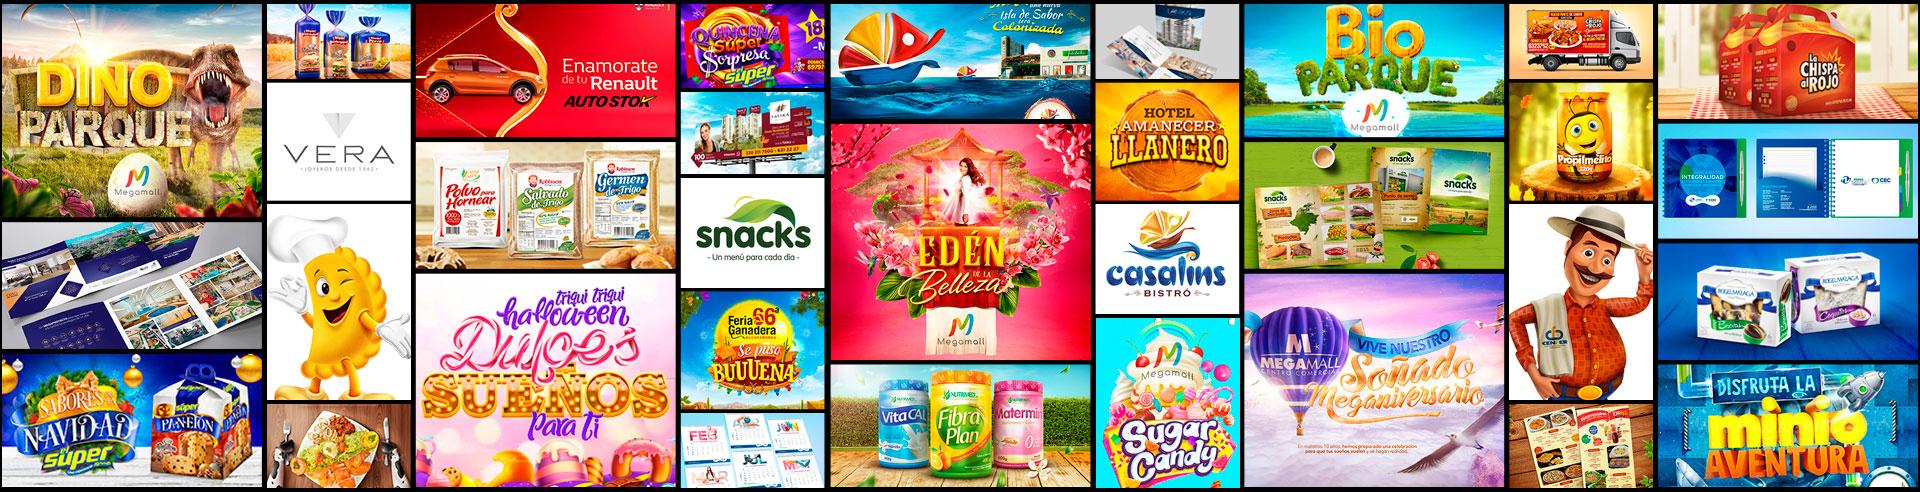 agencia-publicidad-mad-2019-bucaramanga-bogota